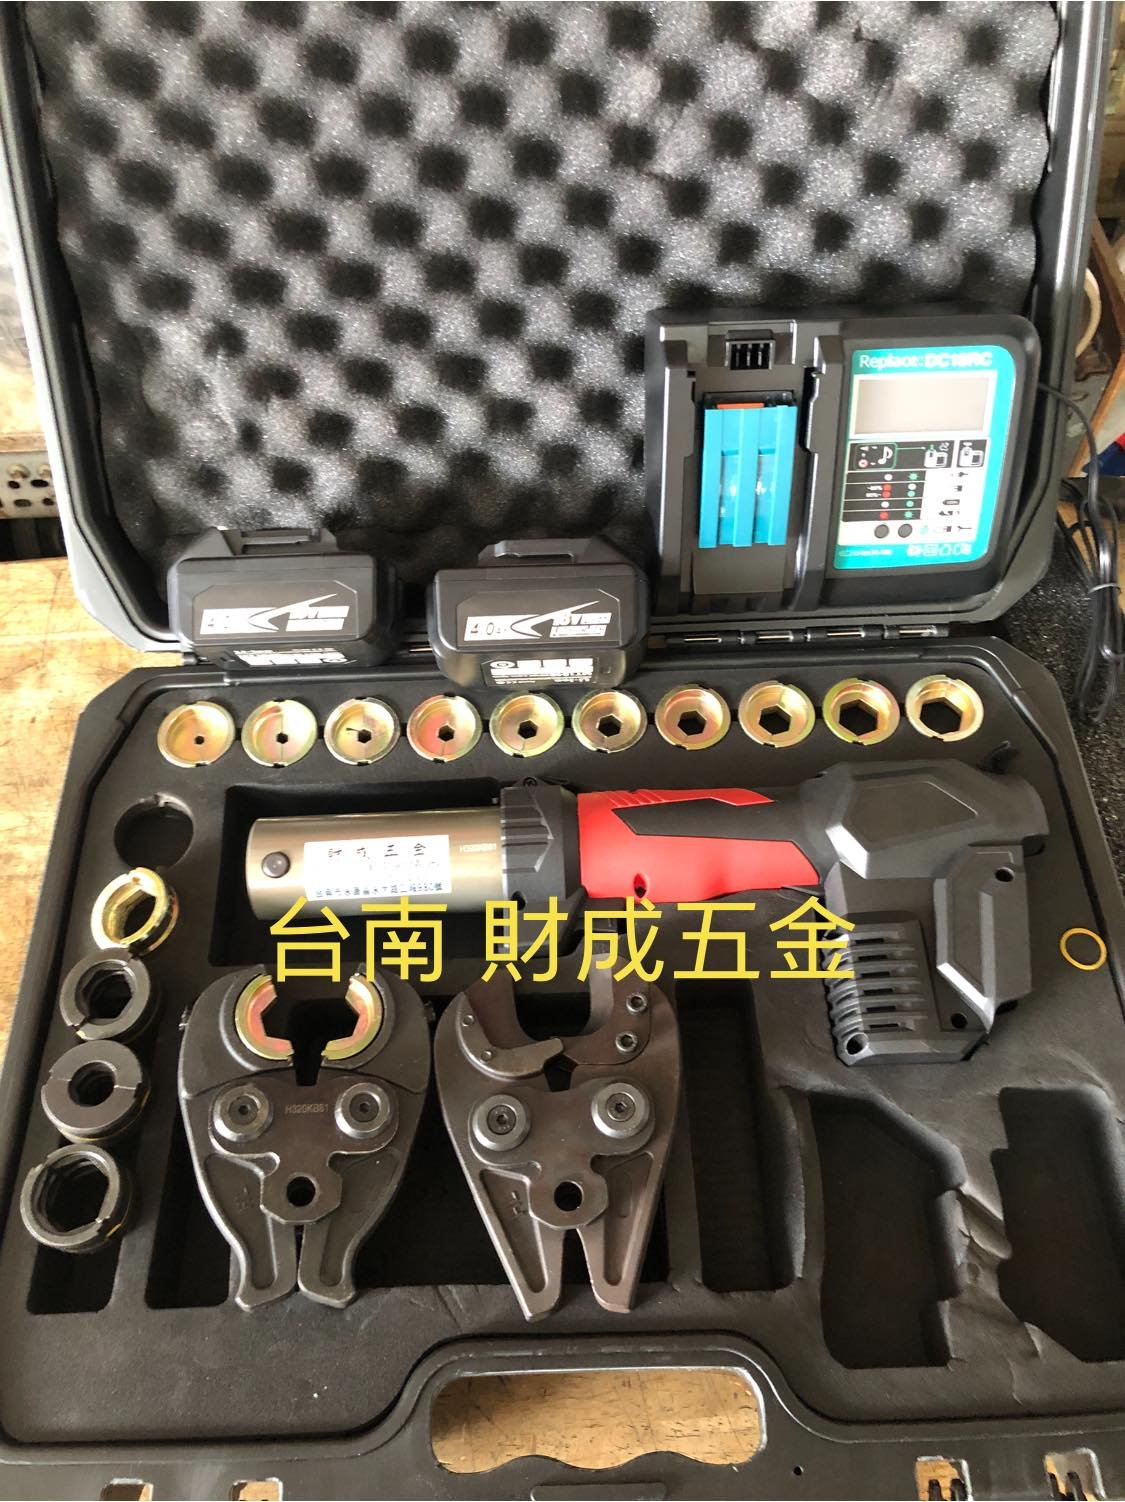 FKS BOST 4288職業級 直上牧田18v水管壓接機4.5頓水模組替換式 端子壓接 電纜剪 6.0電池X2 全配件